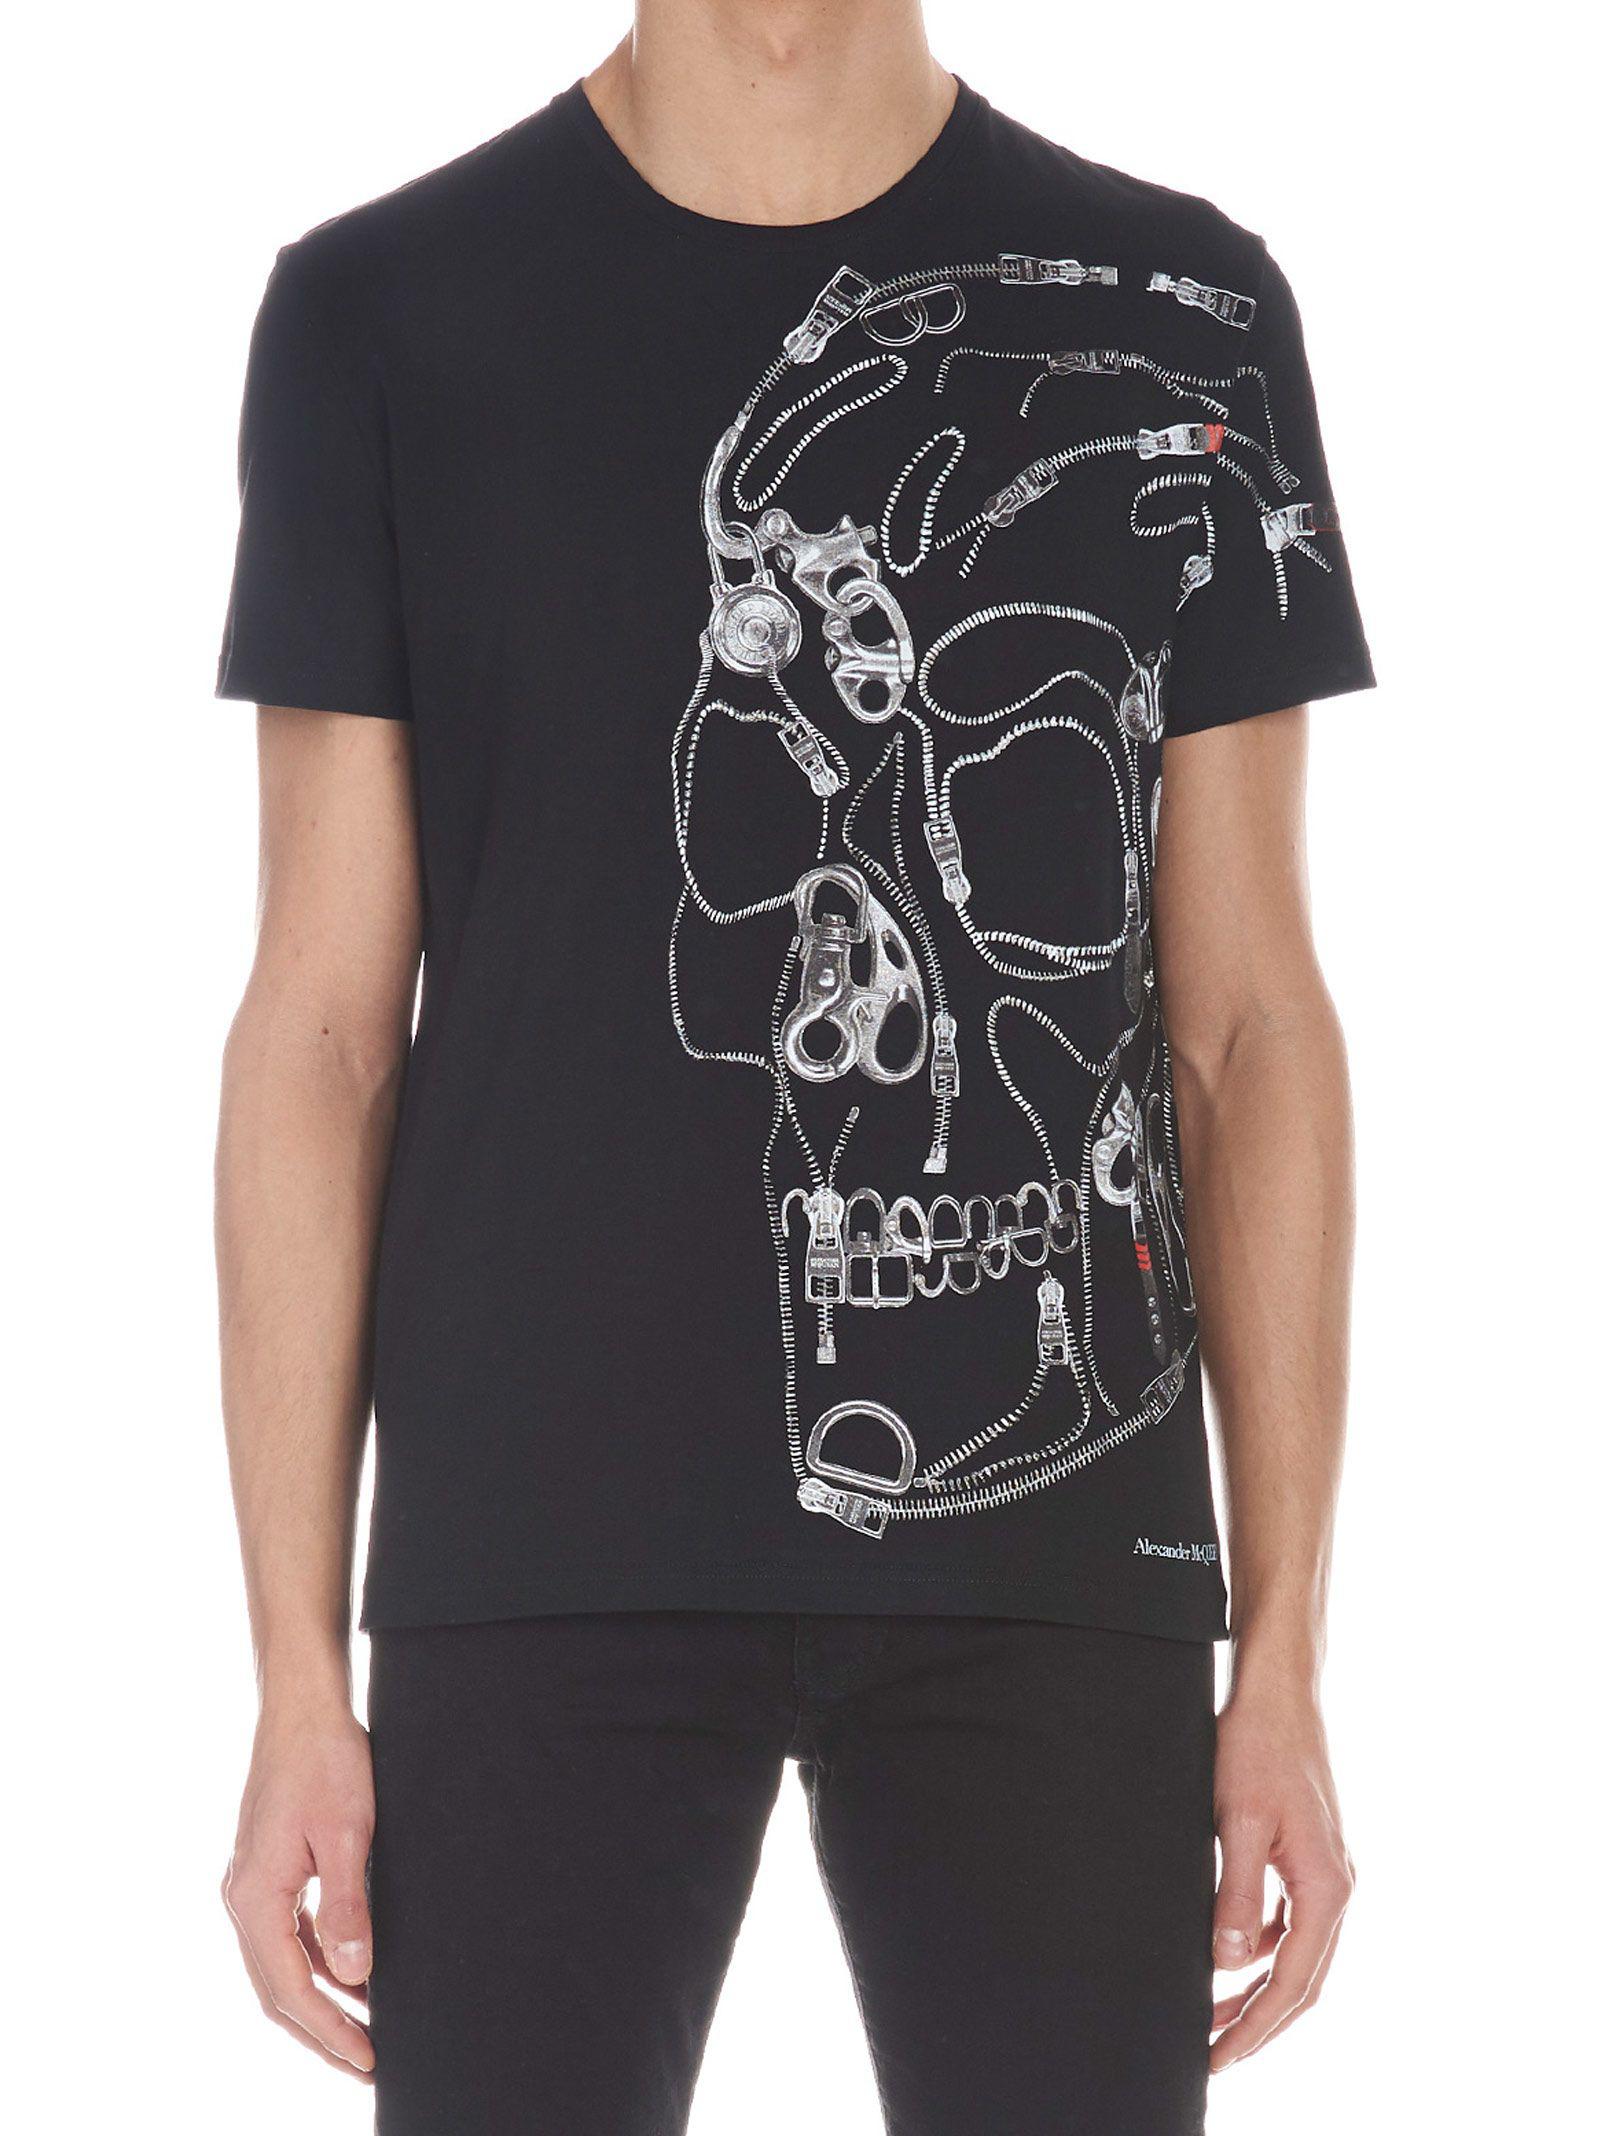 15b87aff Alexander Mcqueen 'Skull Profile' T-Shirt In Black | ModeSens